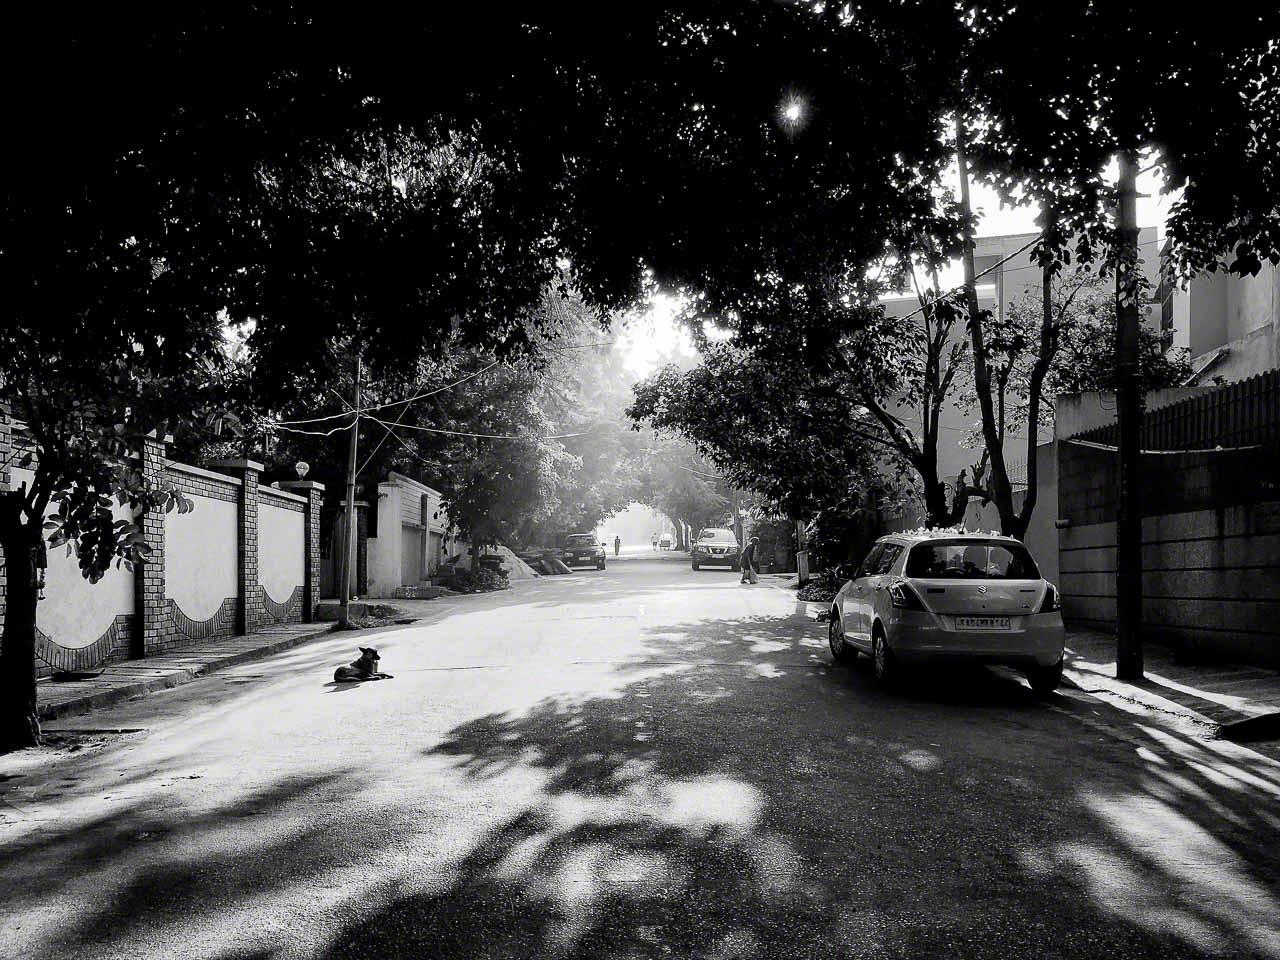 151018-bangalore-074712-Edit-instagram.jpg